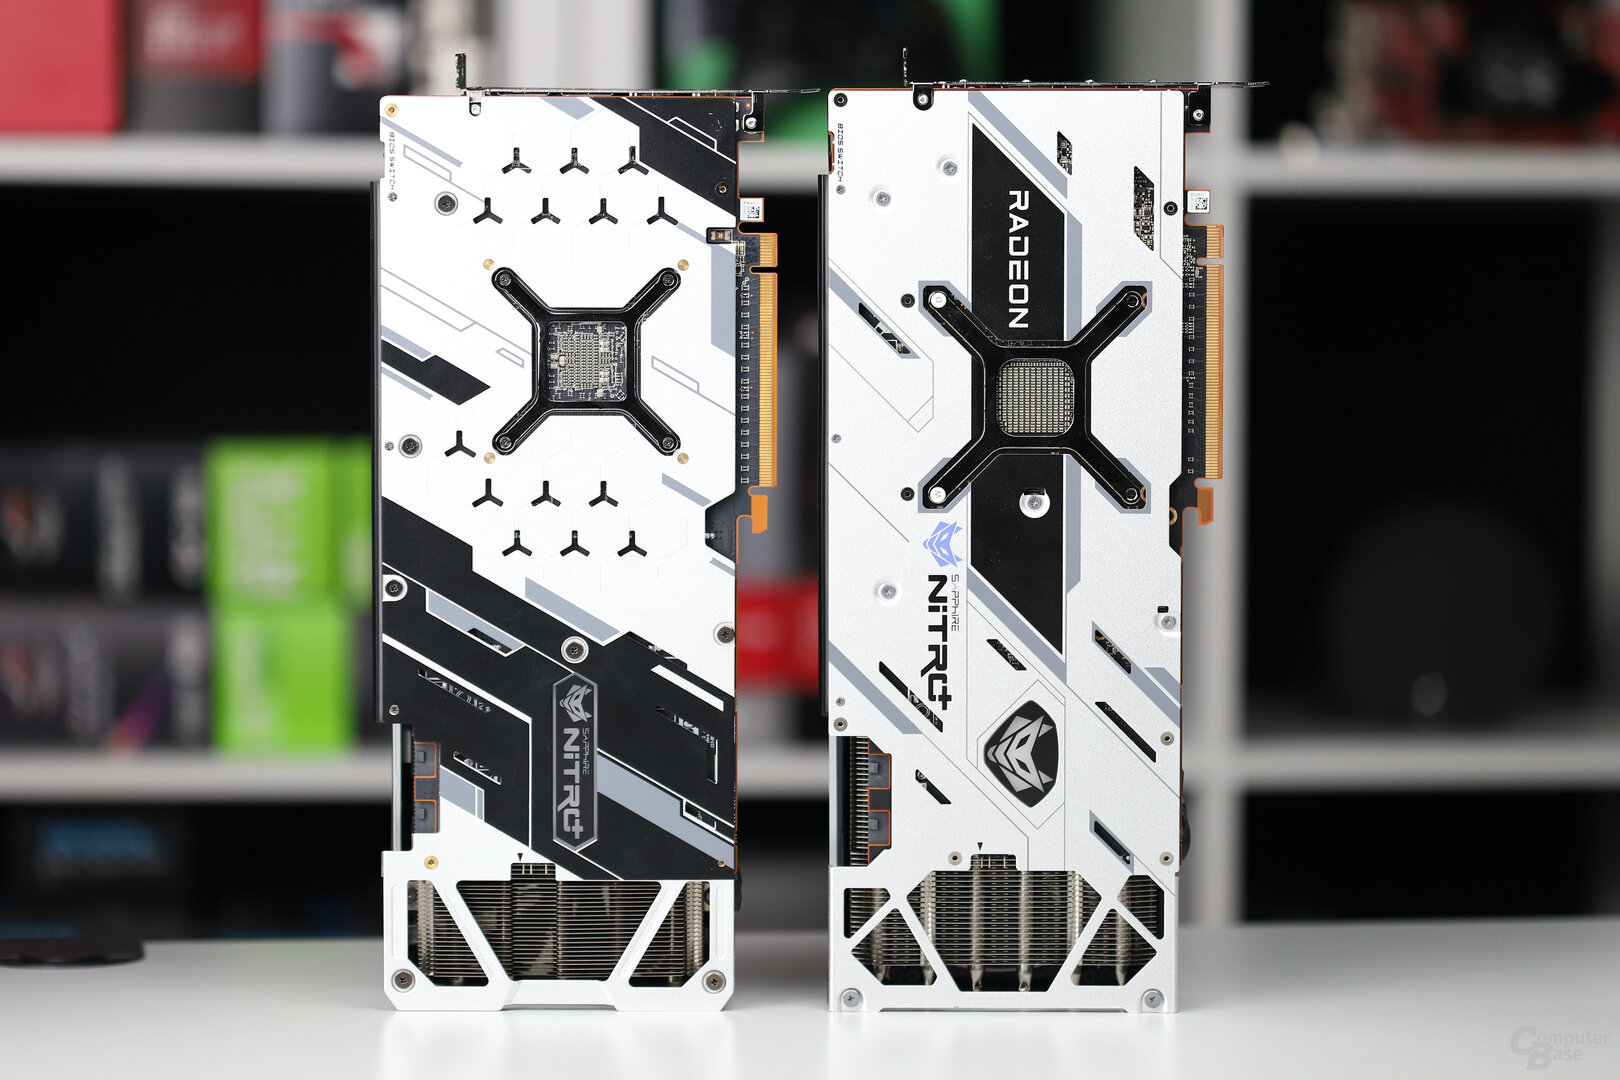 Sapphire RX 6800 XT Nitro+ (rechts) und RX 5700 XT Nitro+ (links)